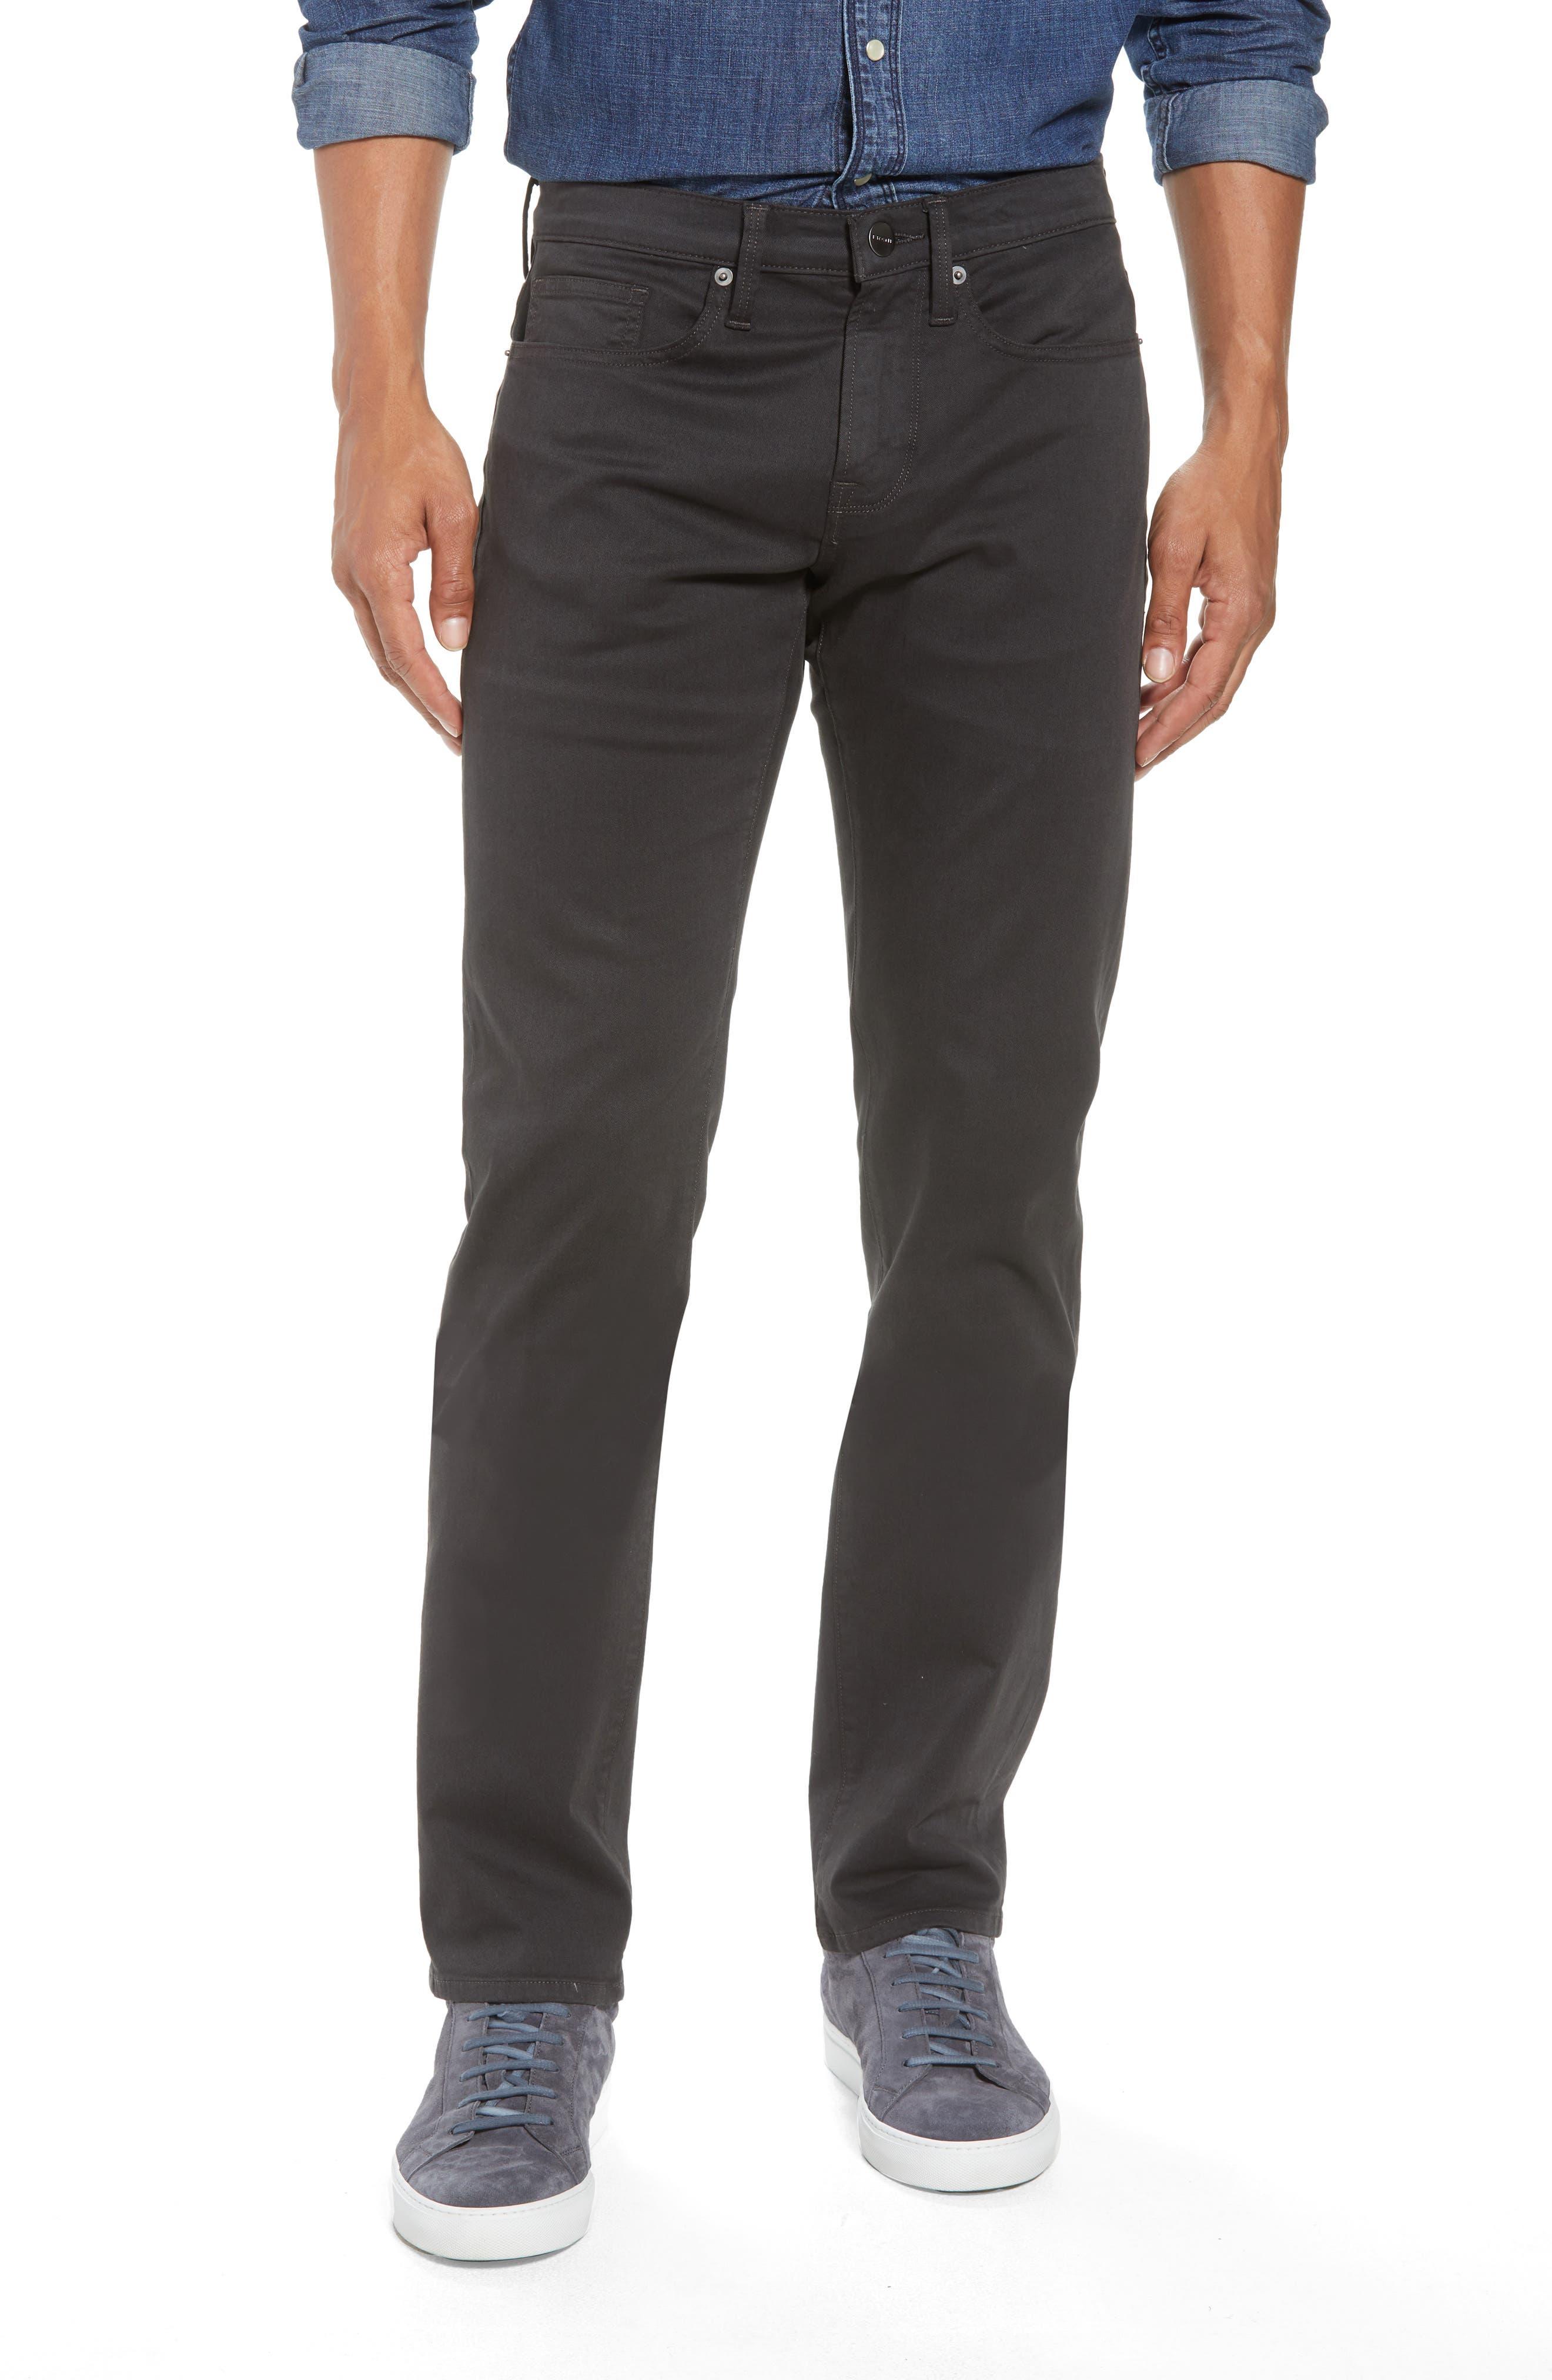 L'Homme Slim Fit Chino Pants,                         Main,                         color, HEMATITE